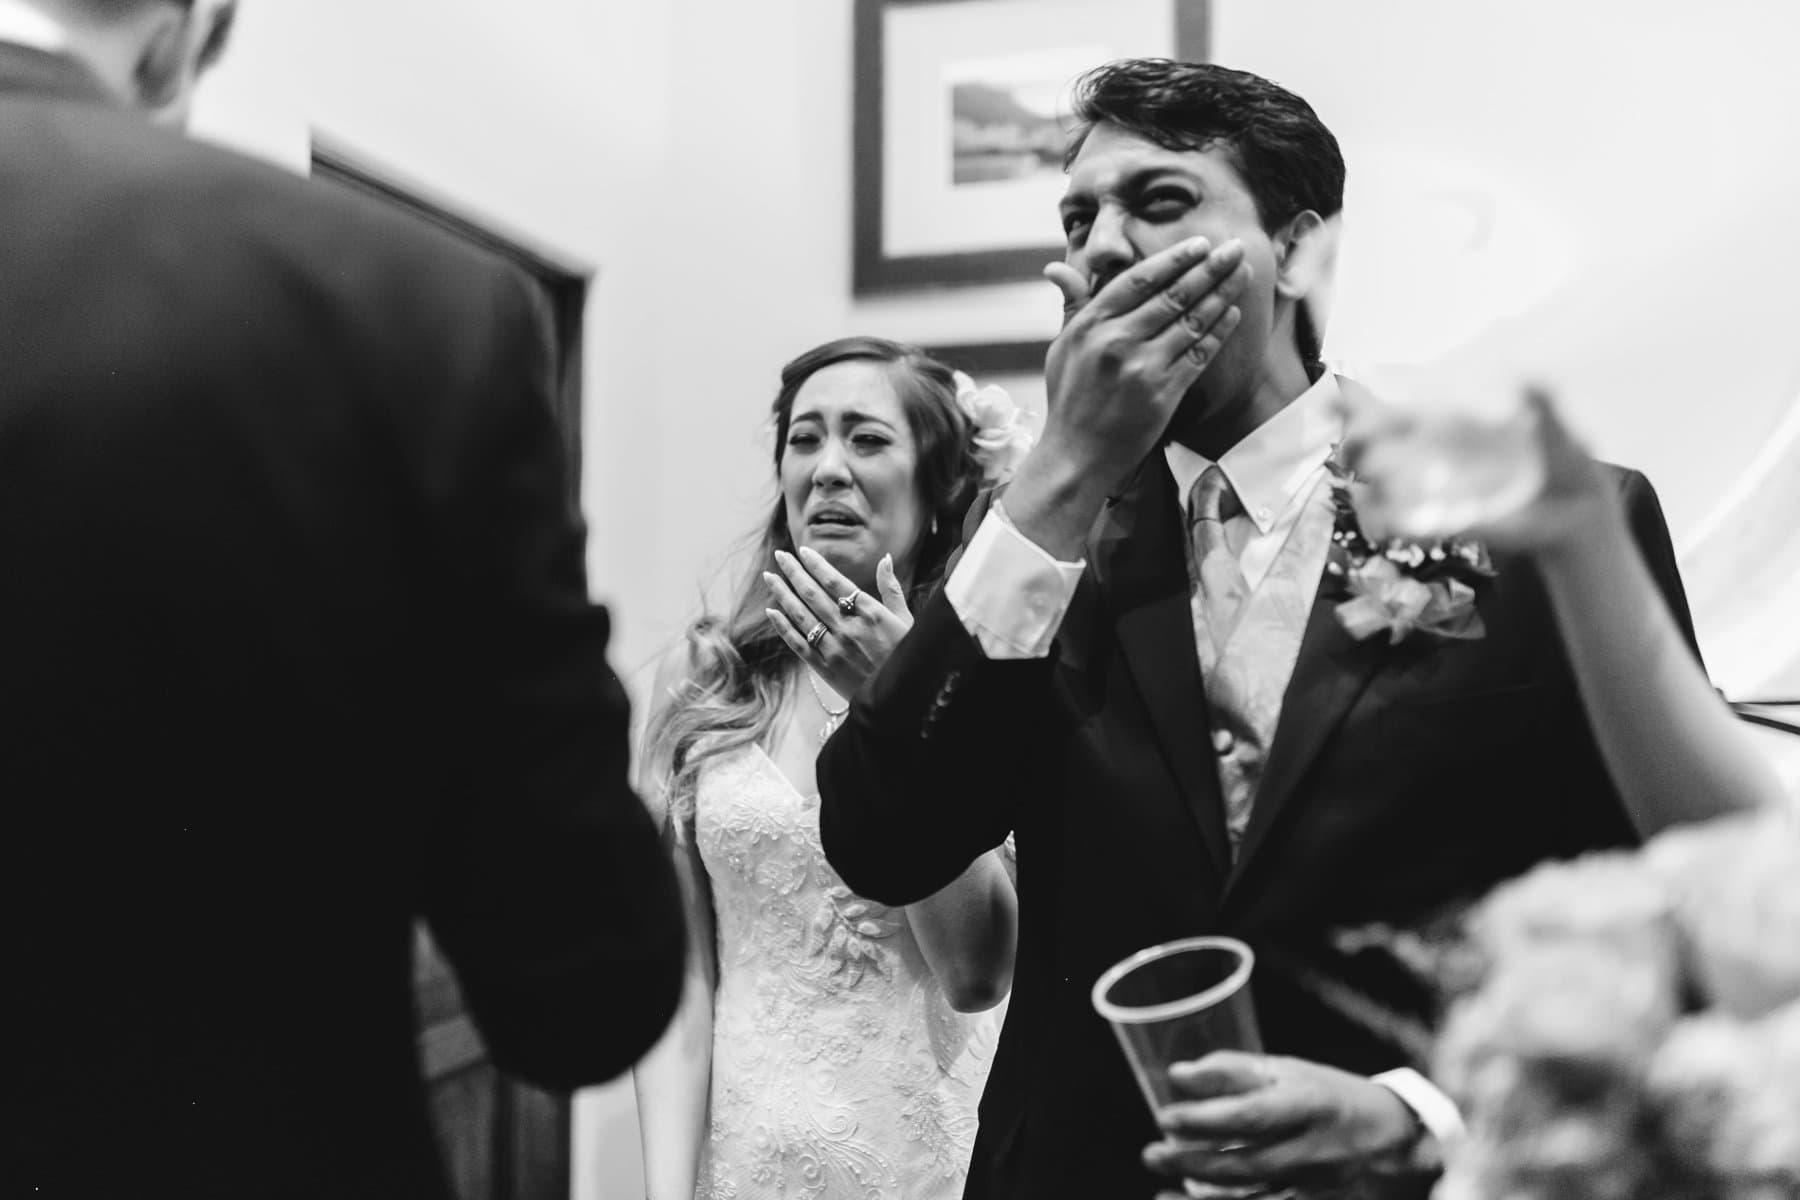 the post wedding toast was strong Phoenix documentary candid wedding photographer